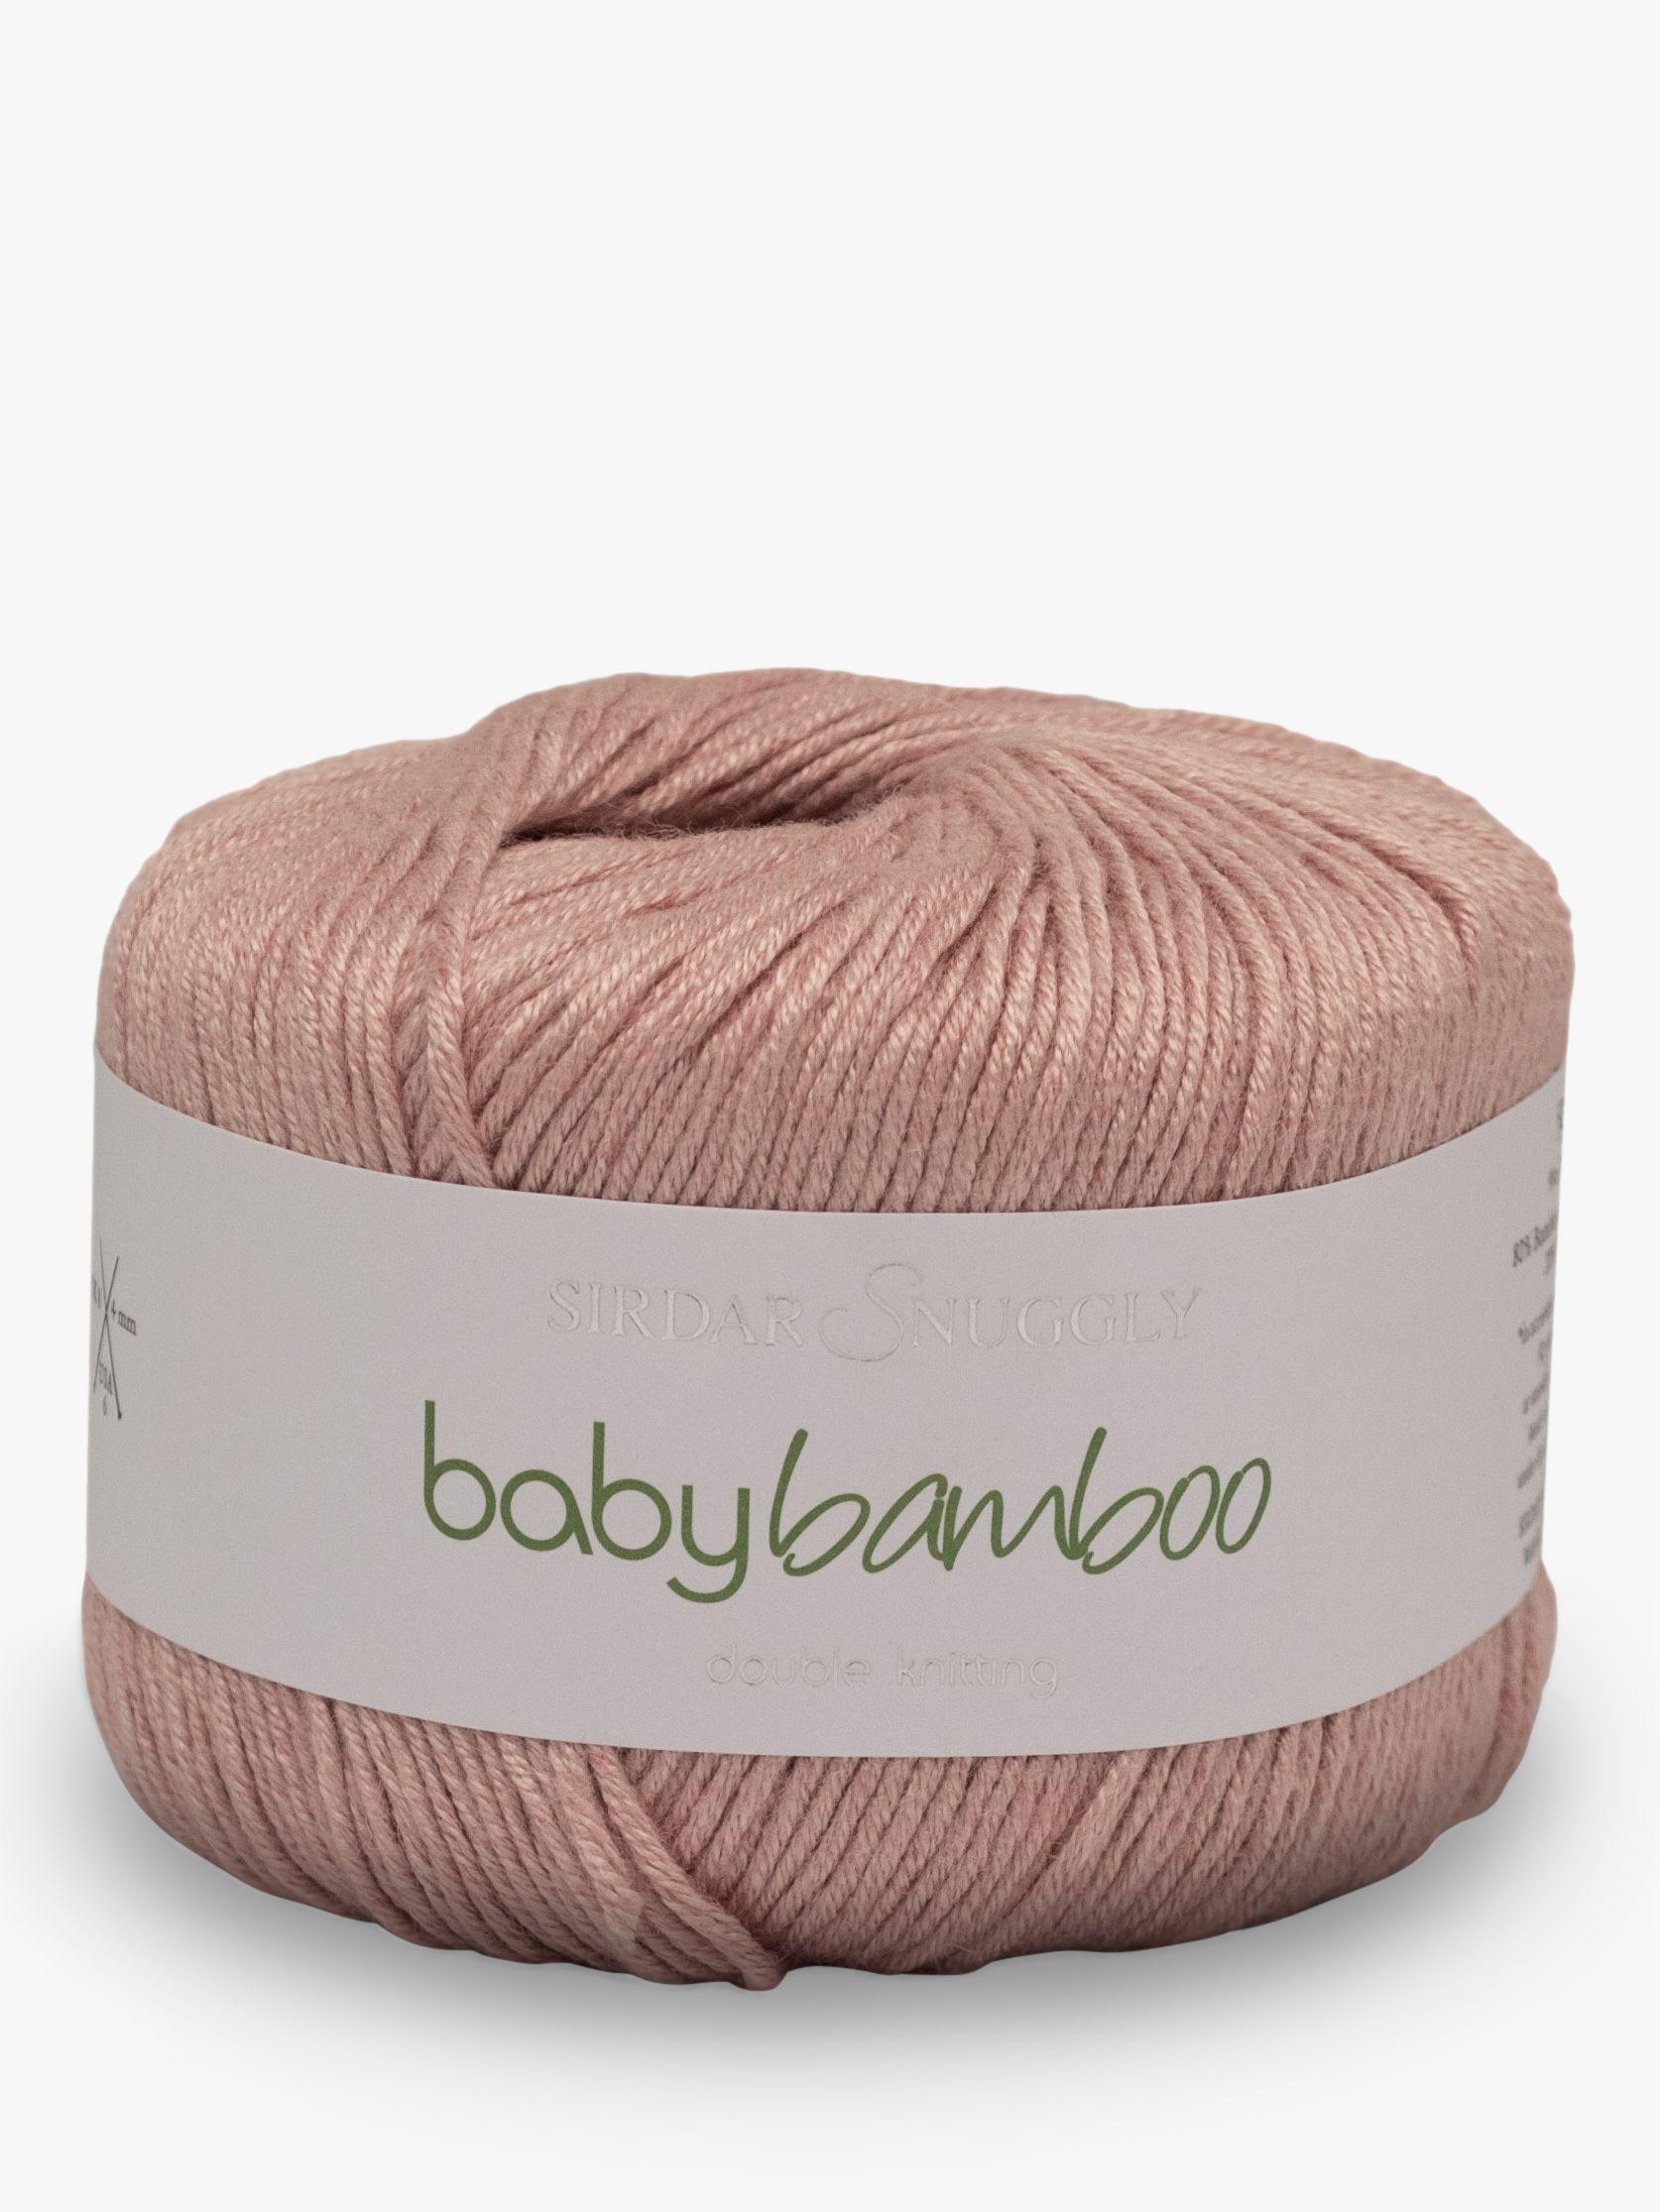 Sirdar Sirdar Baby Bamboo DK Linen Yarn, 50g